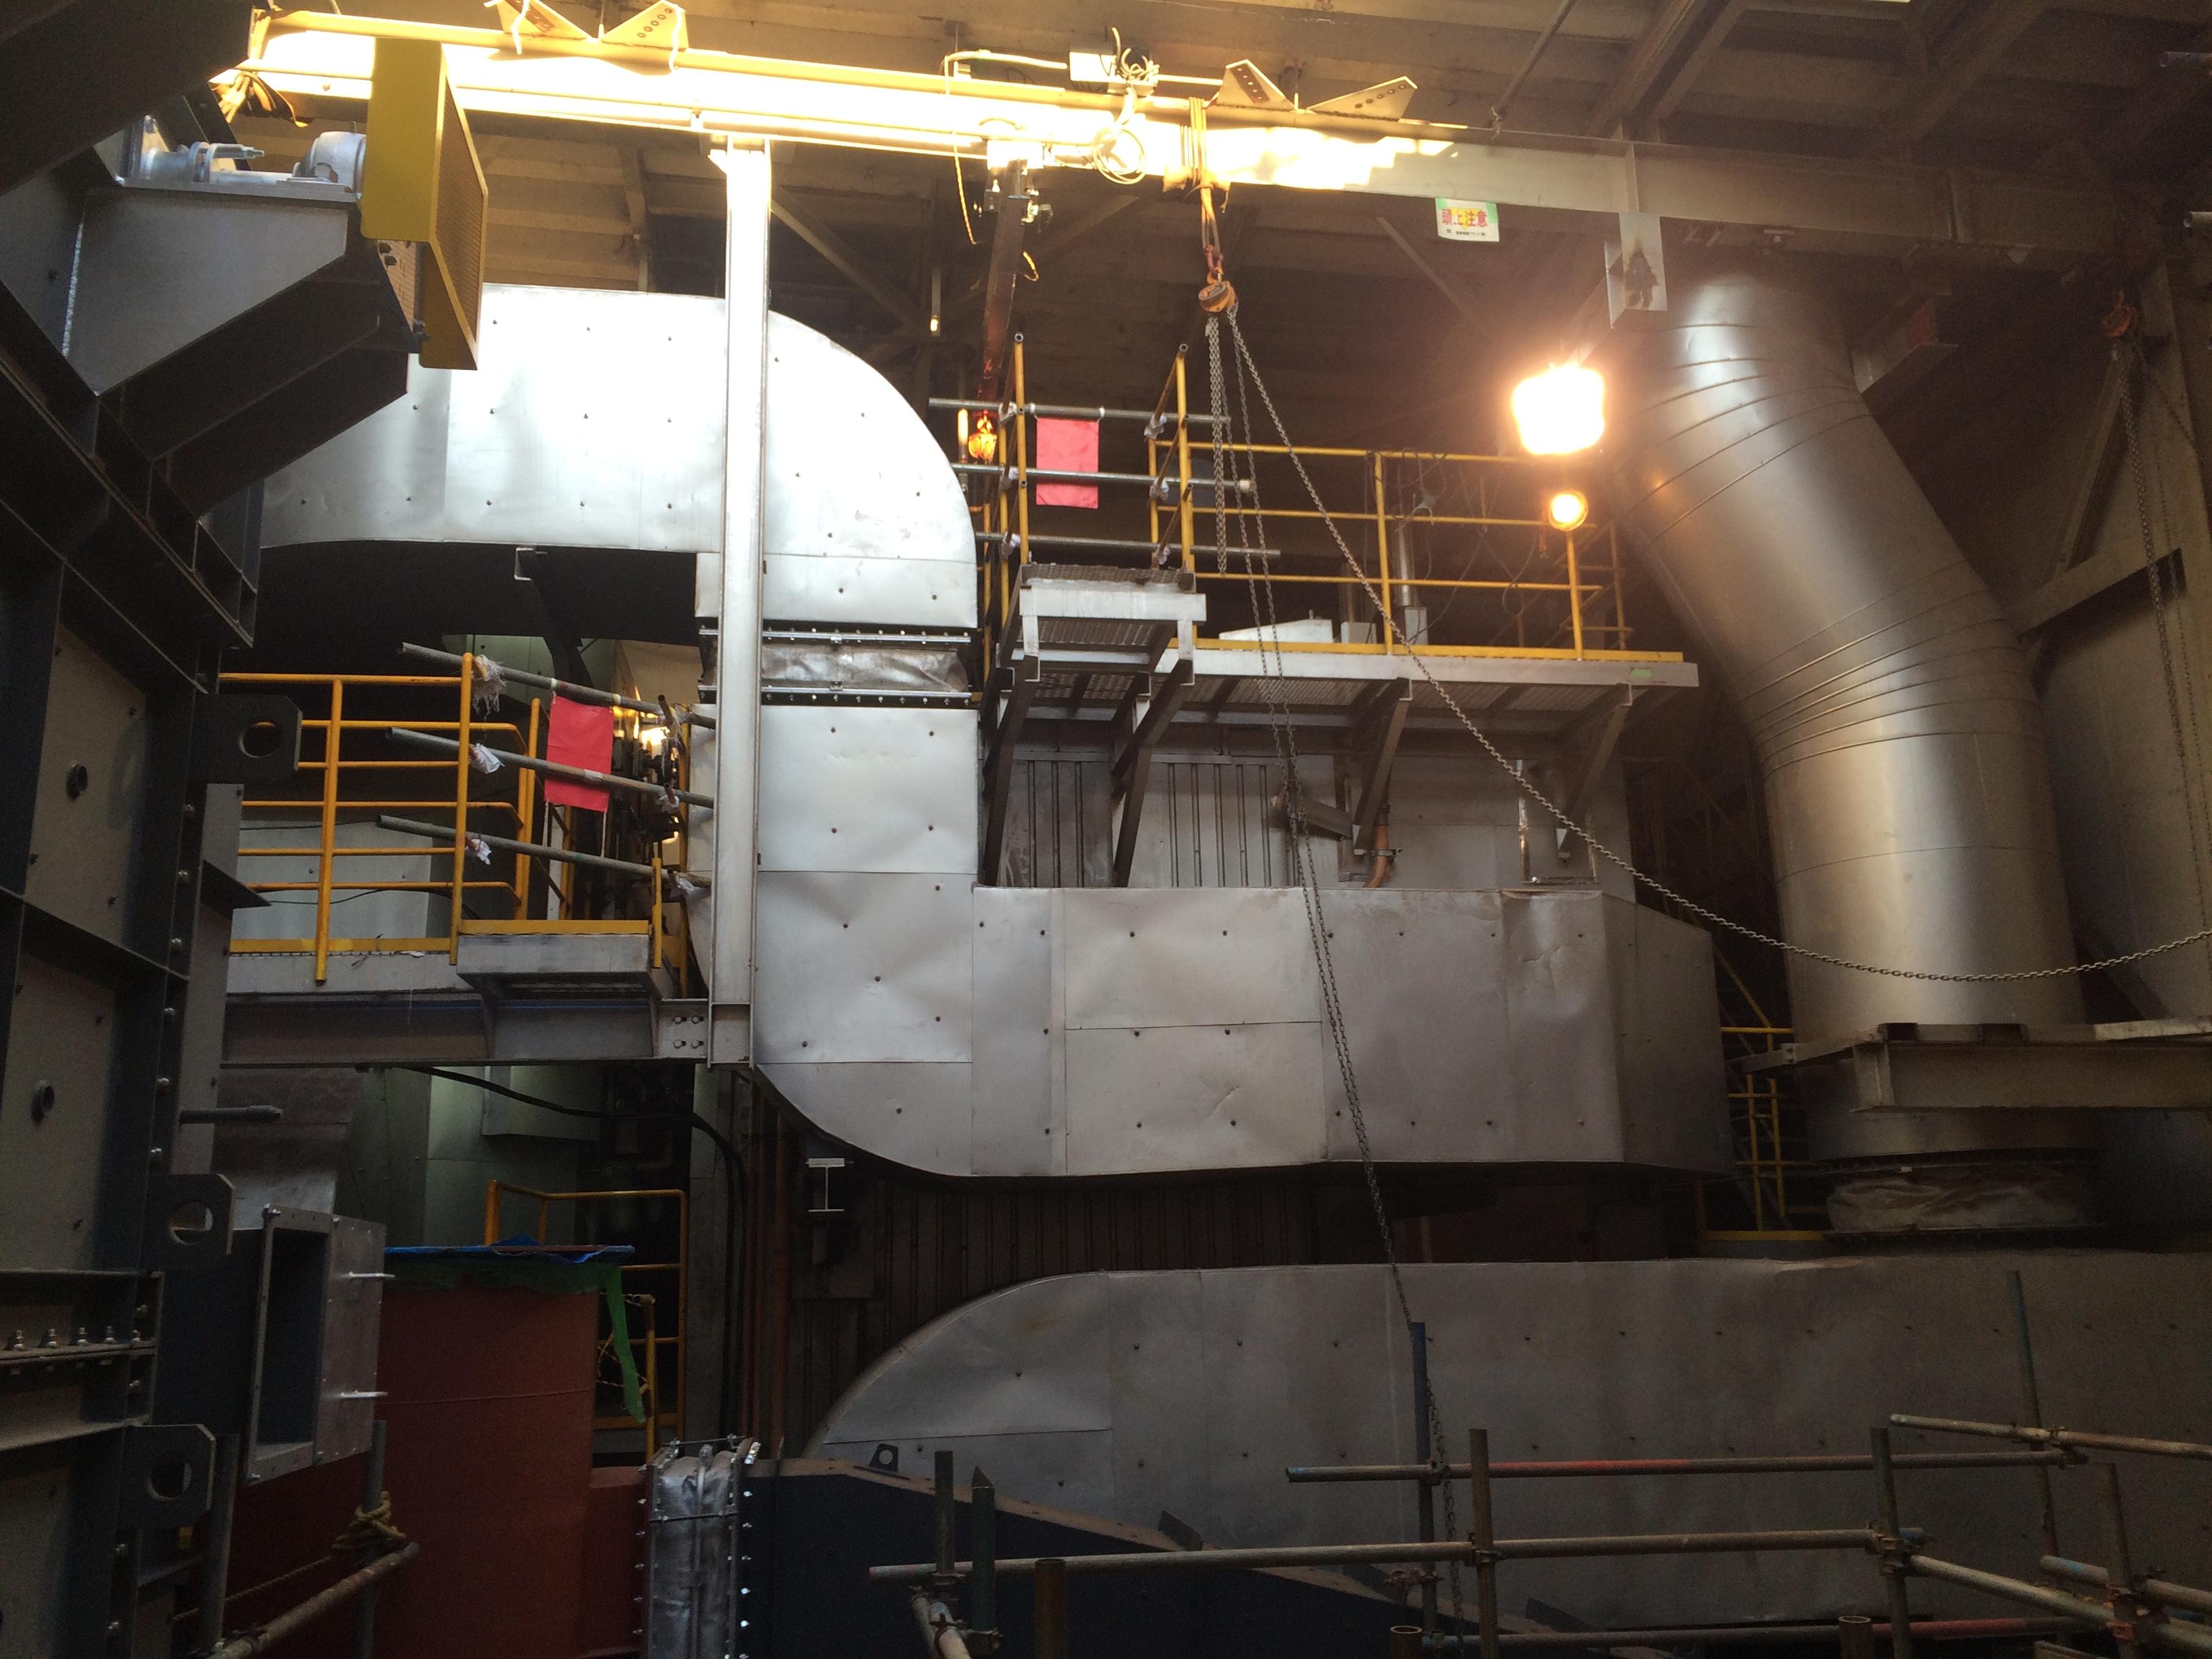 静岡県三島市清掃センター ごみ焼却処理施設基幹的設備整備工事